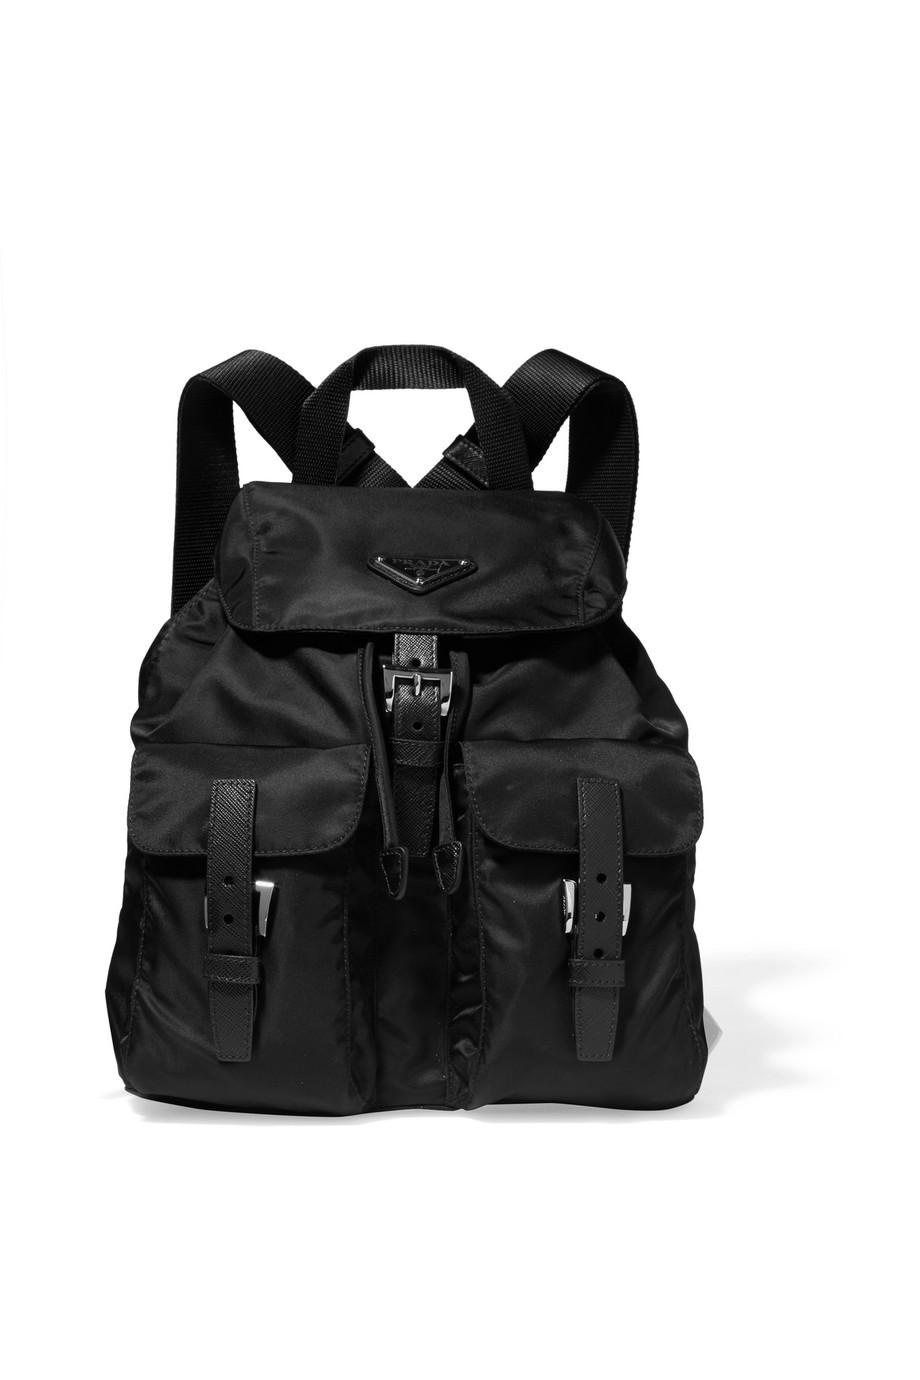 6fb75d689705 Prada Vela small leather-trimmed shell backpack